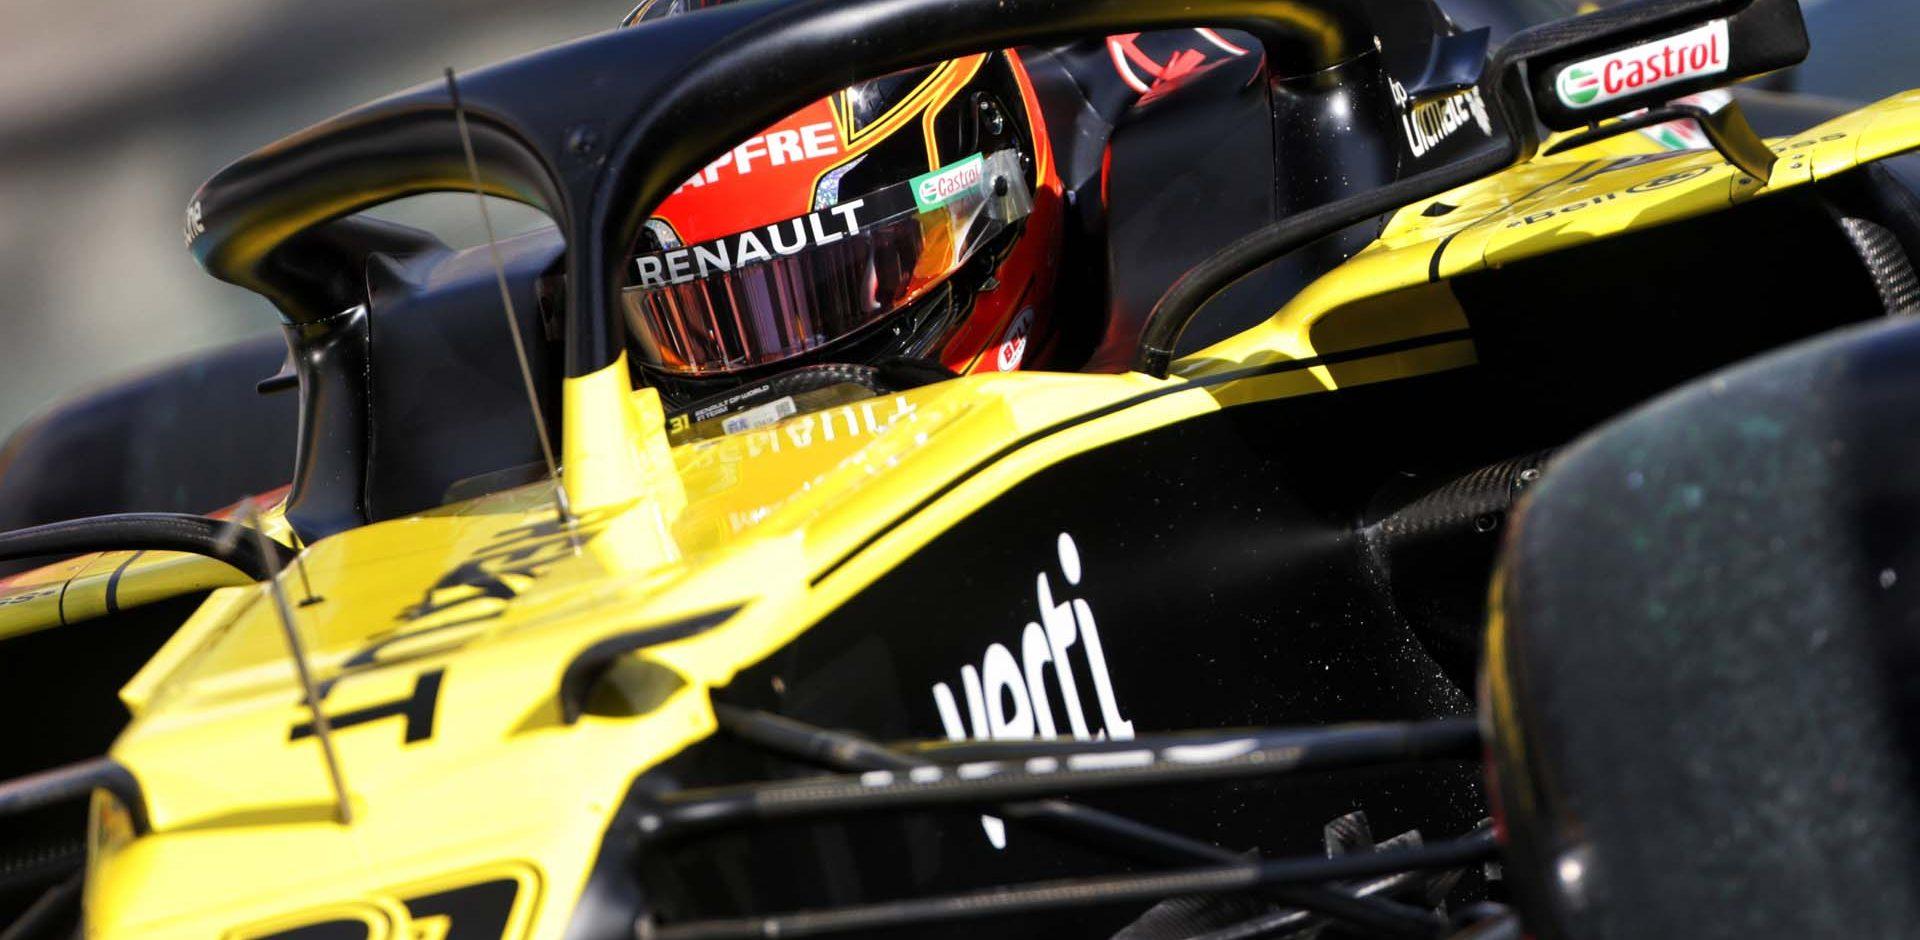 Esteban Ocon (FRA) Renault F1 Team RS20. Eifel Grand Prix, Saturday 10th October 2020. Nurbugring, Germany.